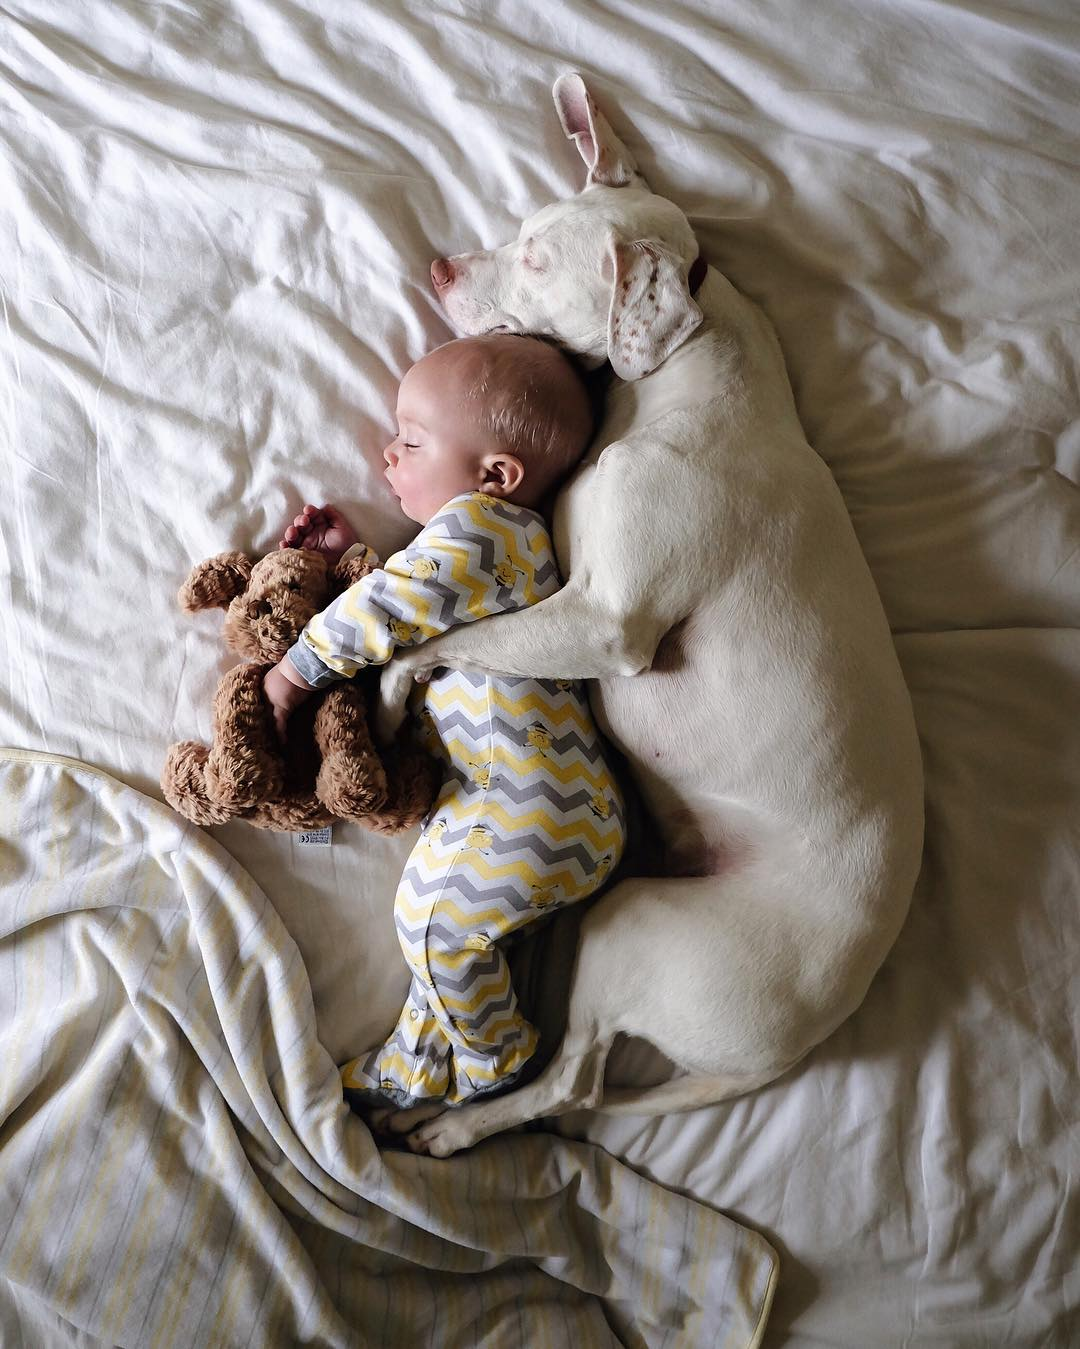 cane dorme con la bambina